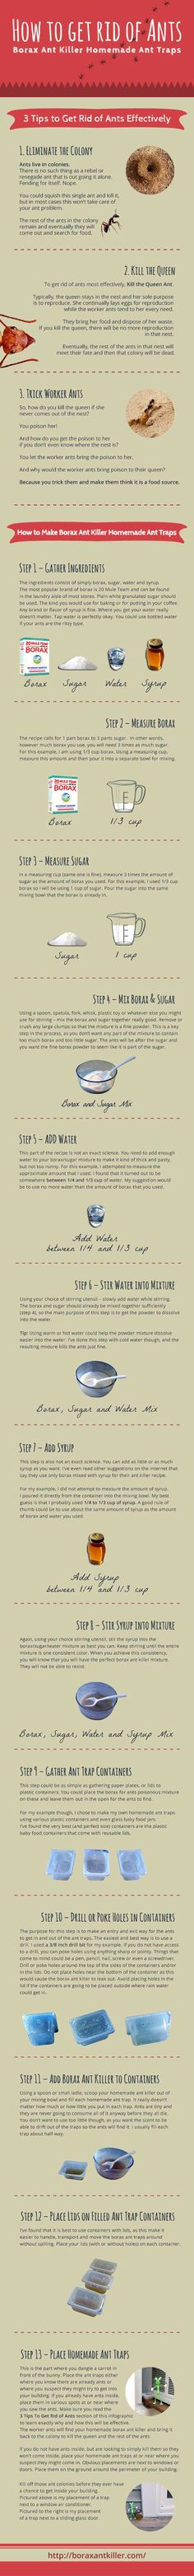 how-to-get-rid-of-ants-homemade-borax-sugar-mixture